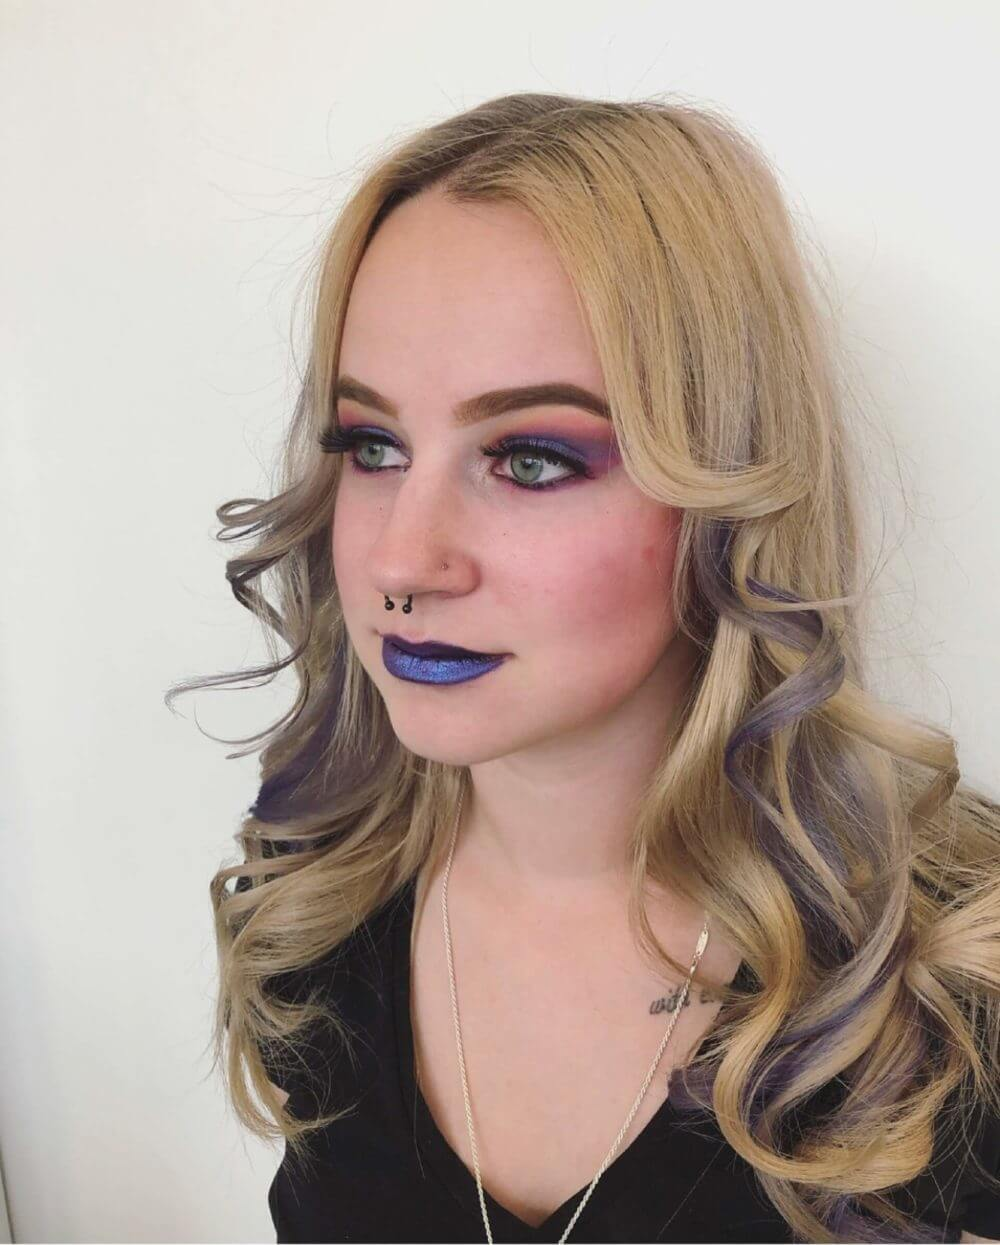 Farbenfrohes Make-up vom Make-up-Artist